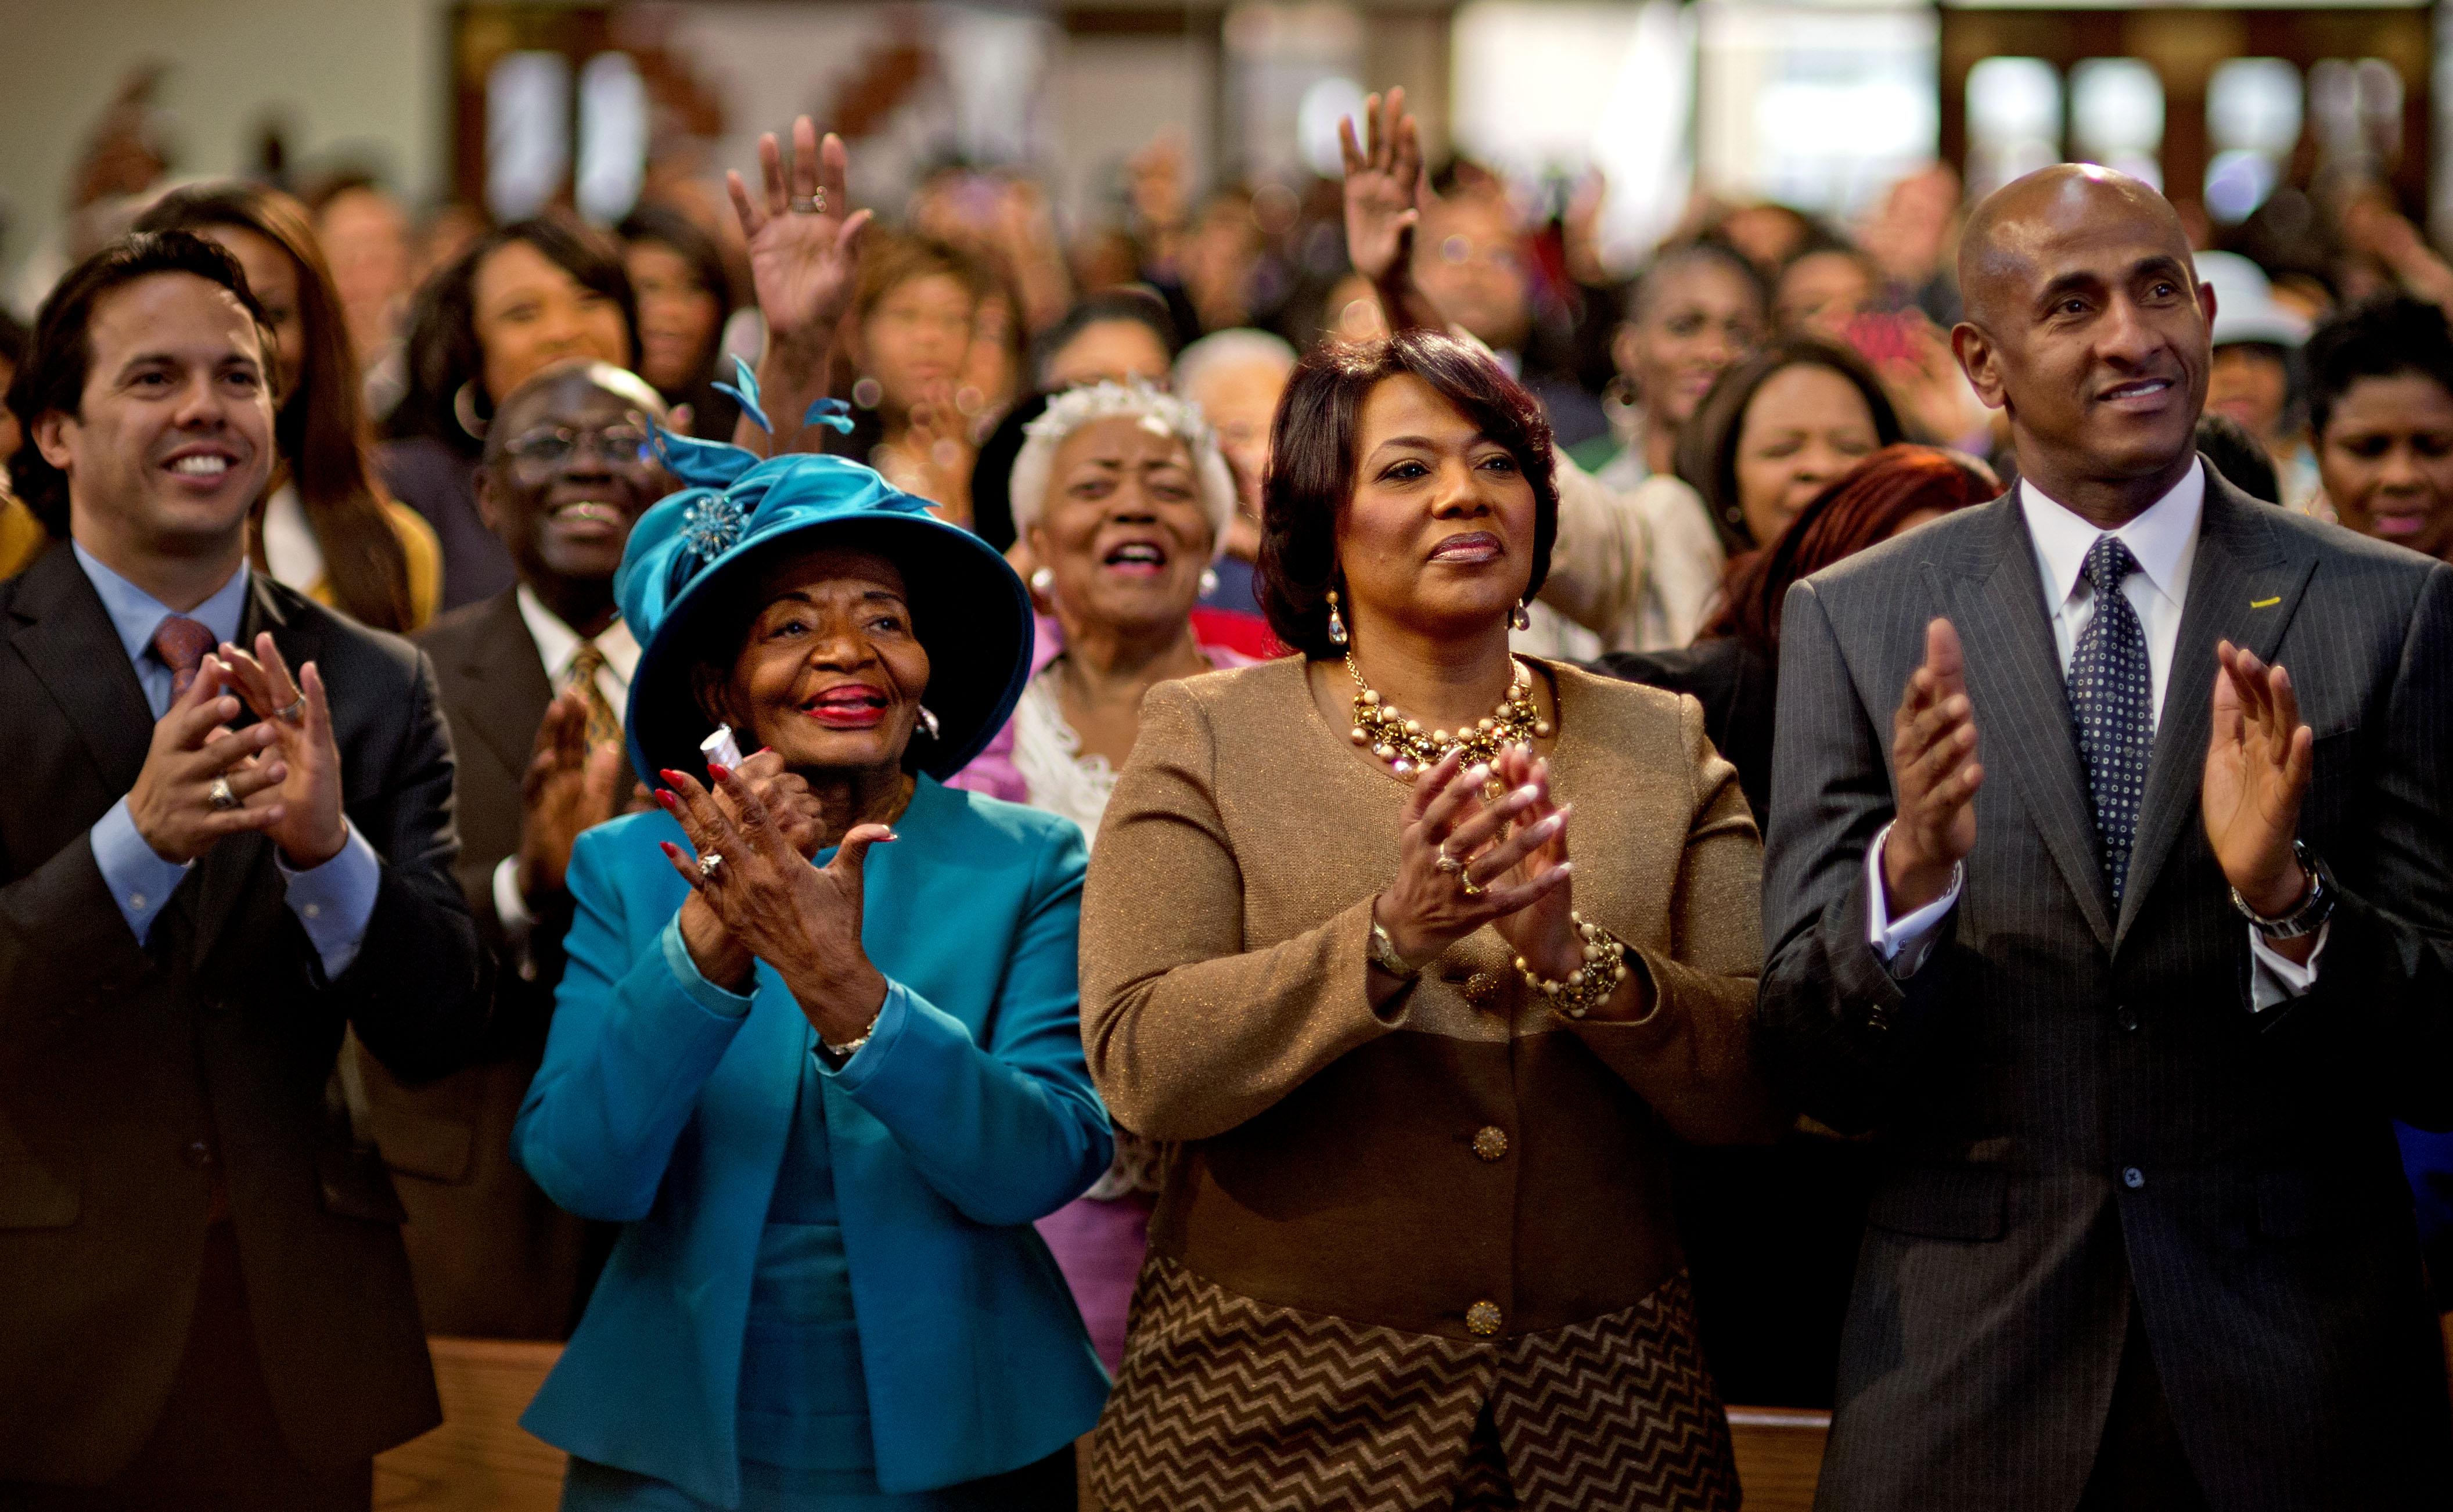 Church service 45